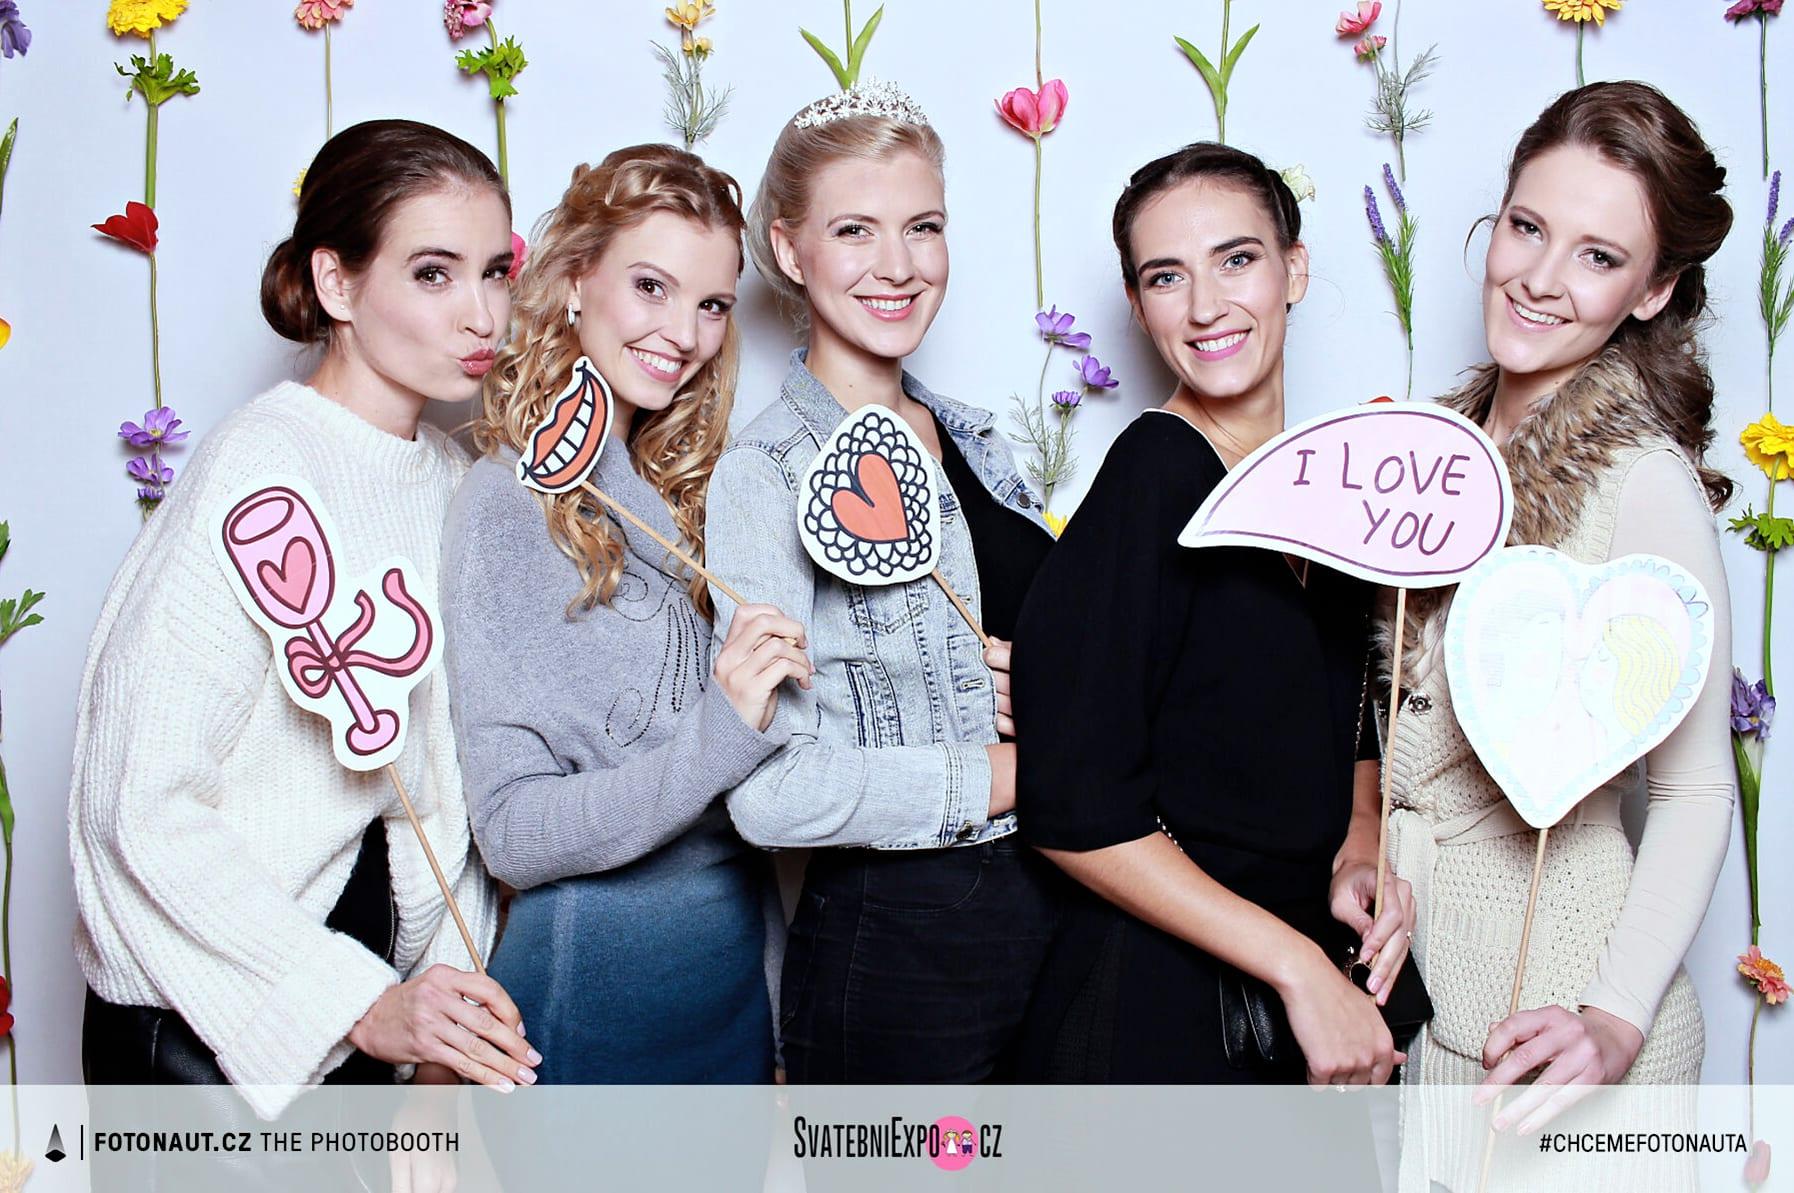 fotokoutek-svatebni-expo-16-11-2018-521637